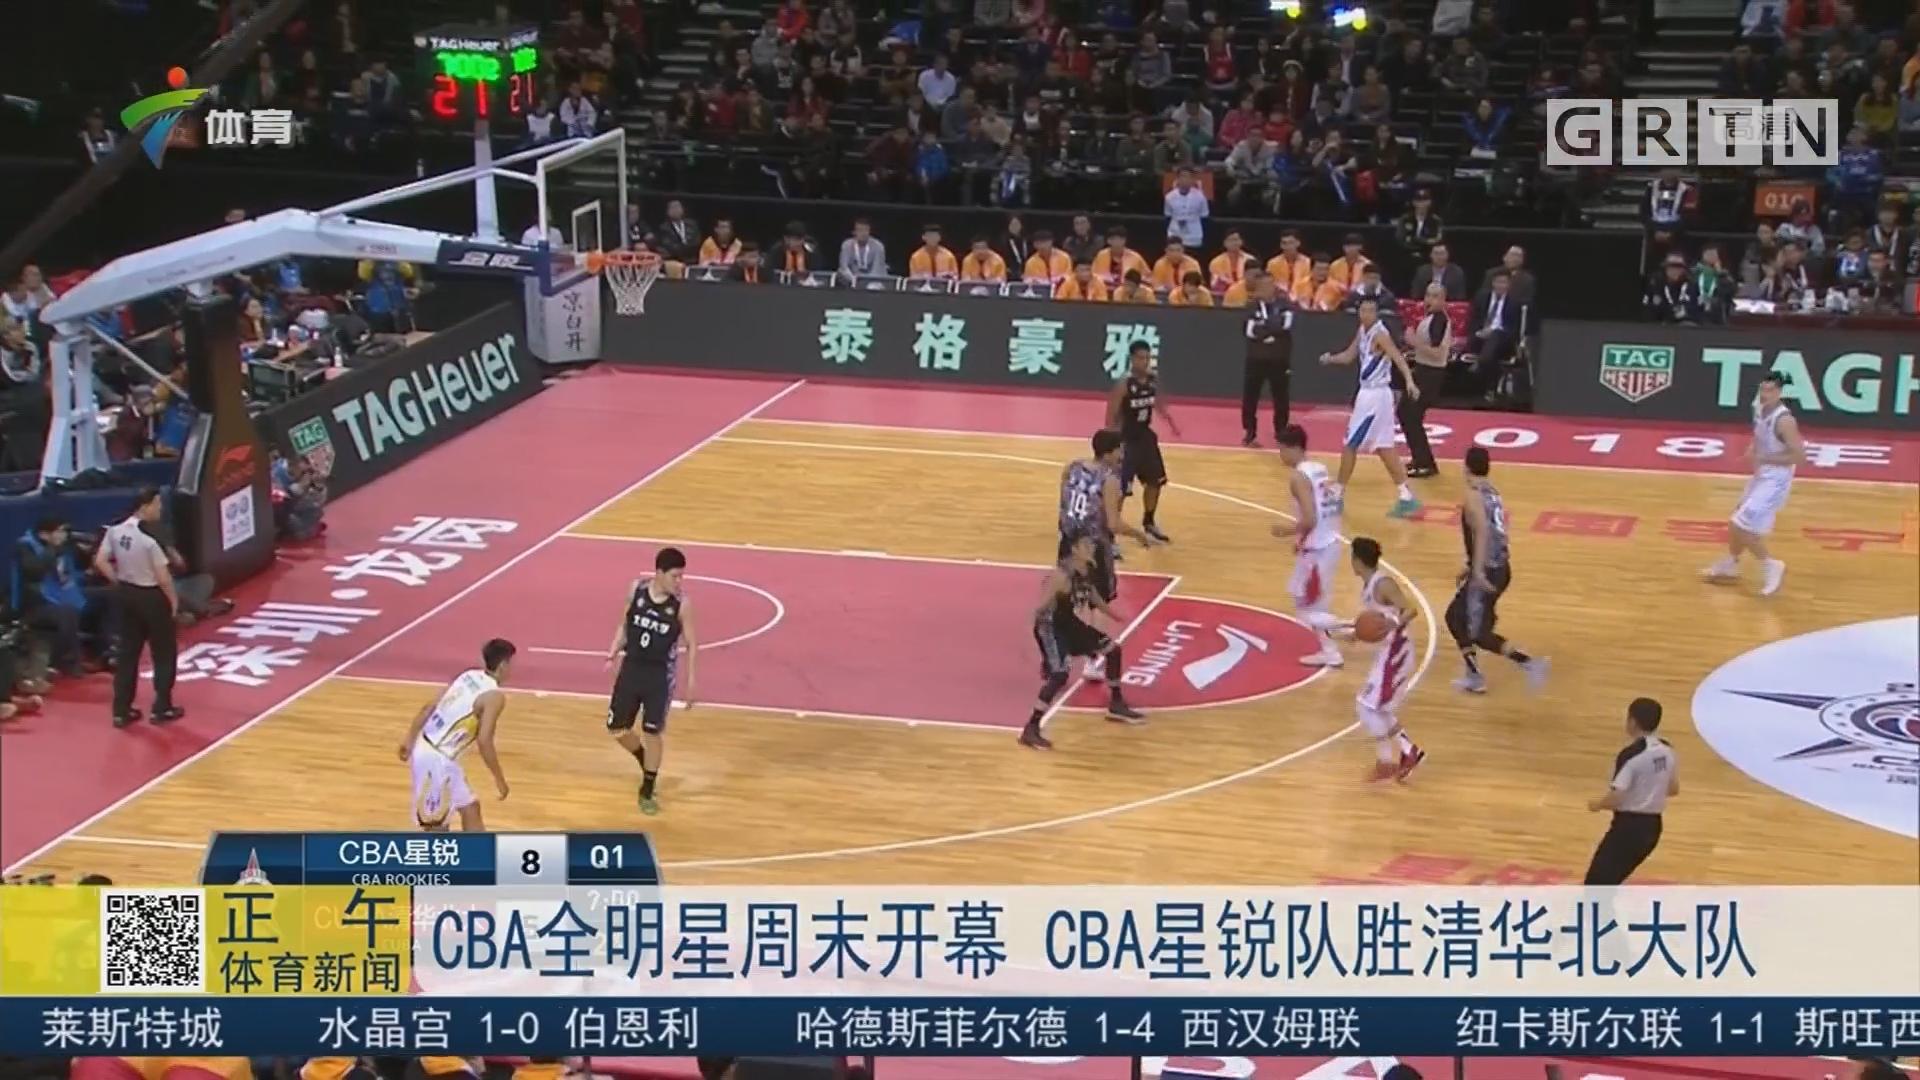 CBA全明星周末开幕 CBA星锐队胜清华北大队